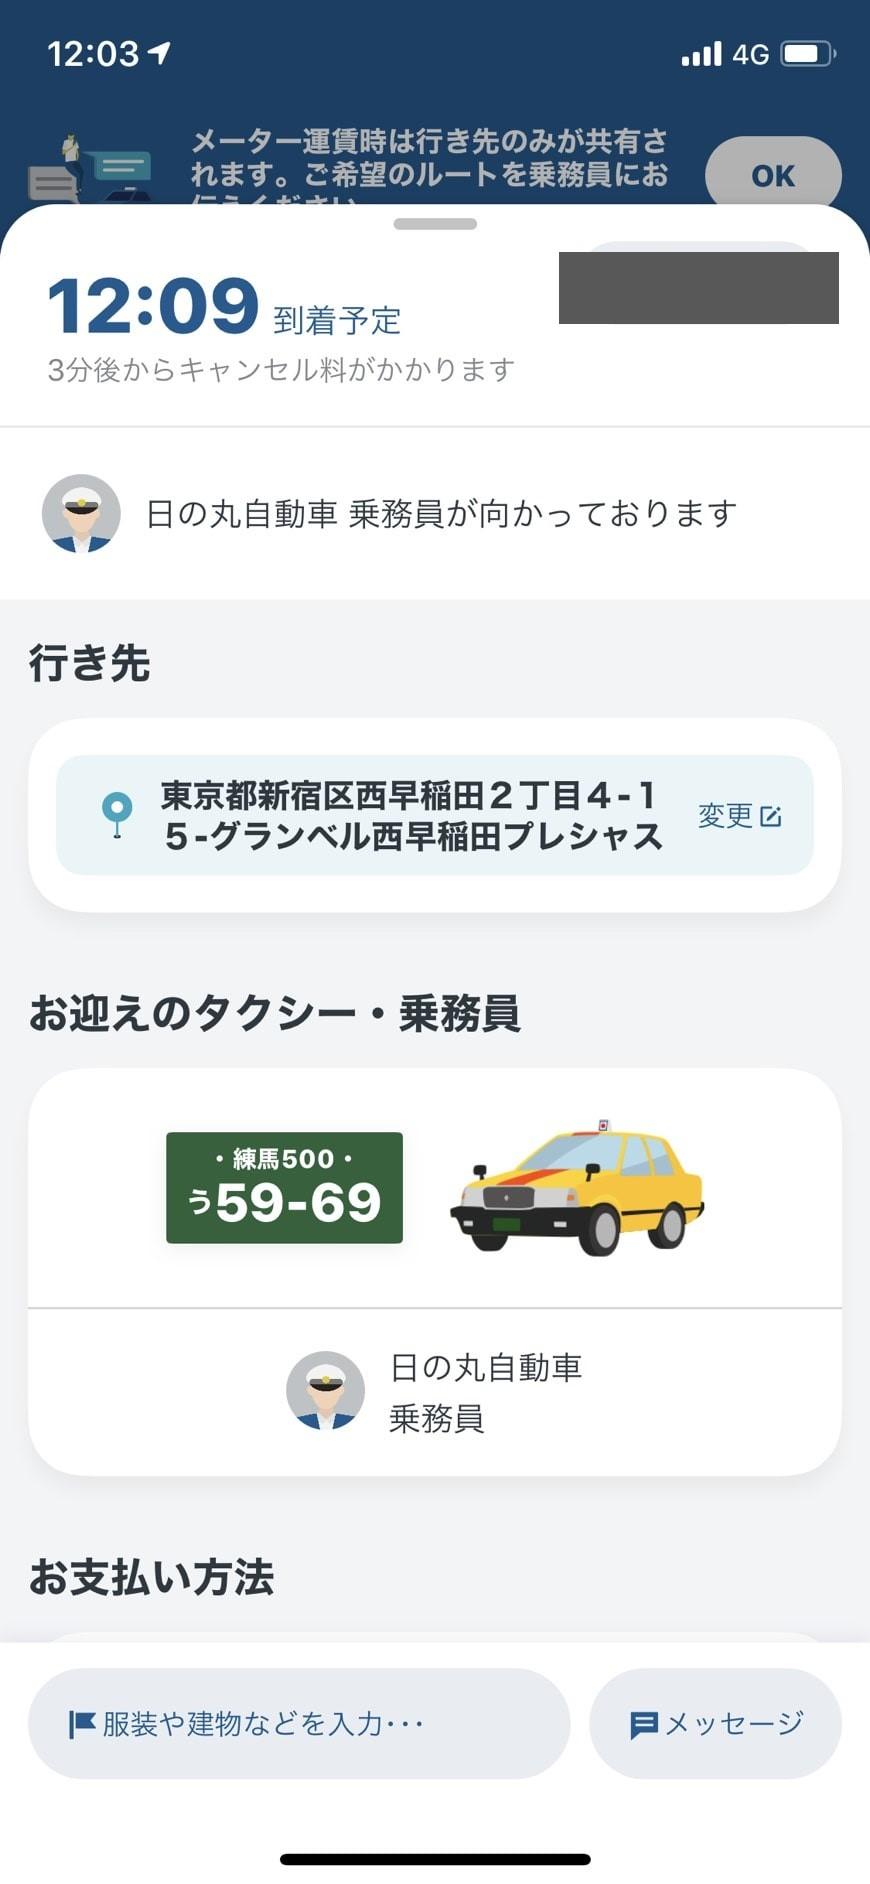 MOVアプリで迎えのタクシーと乗務員を確認